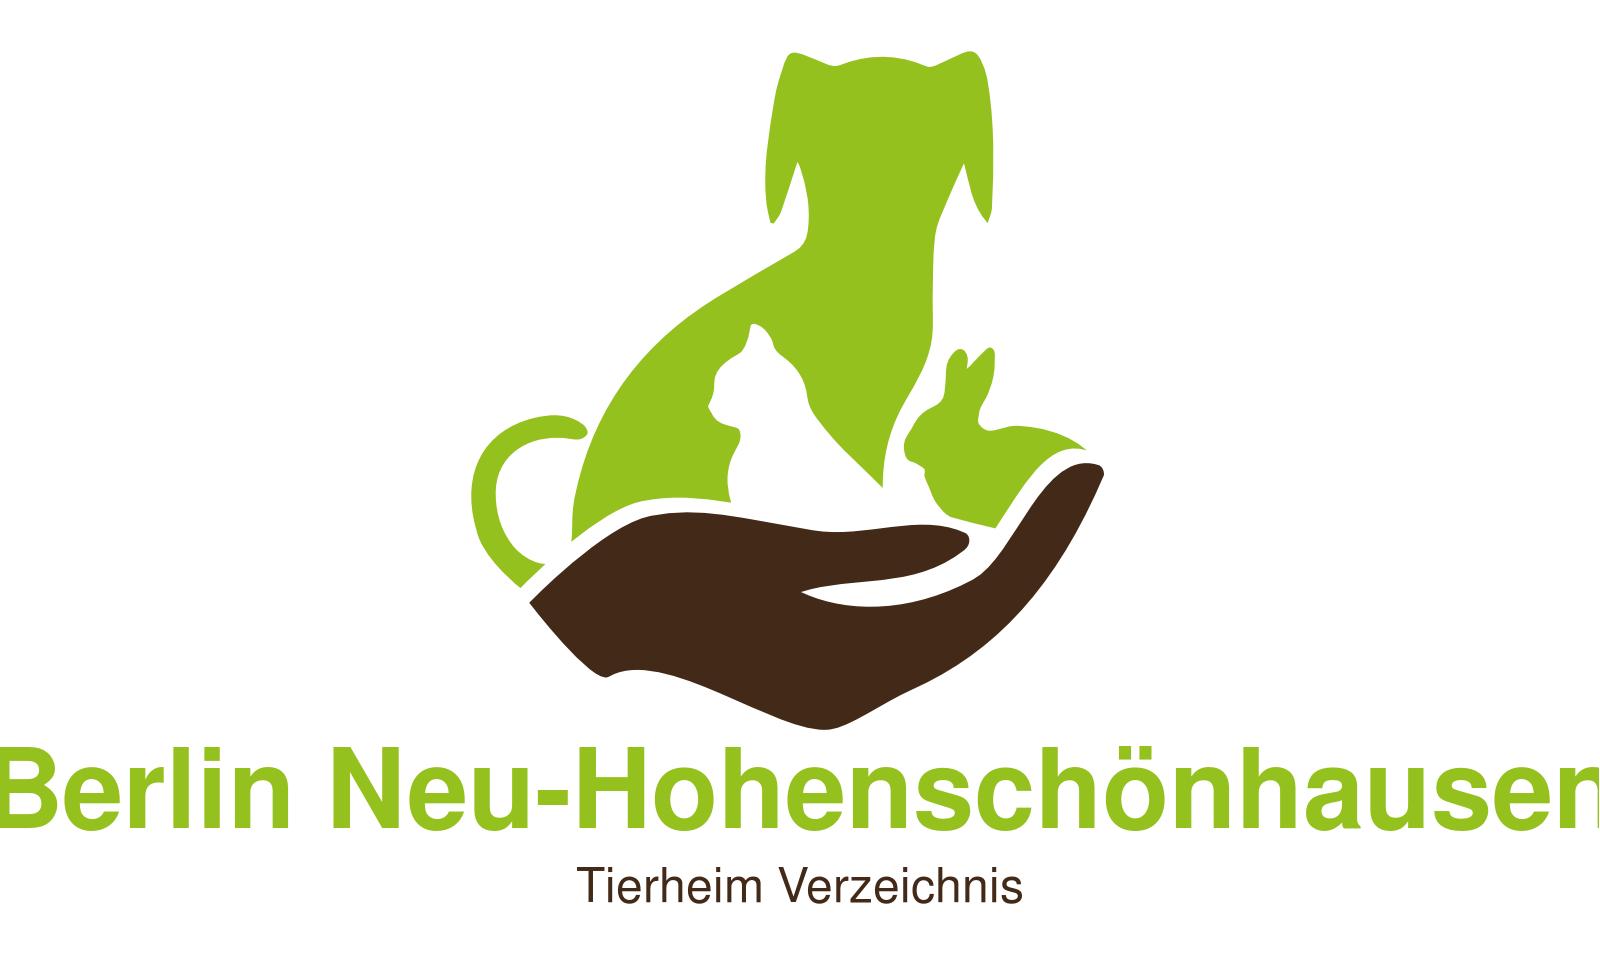 Tierheim Berlin Neu-Hohenschönhausen